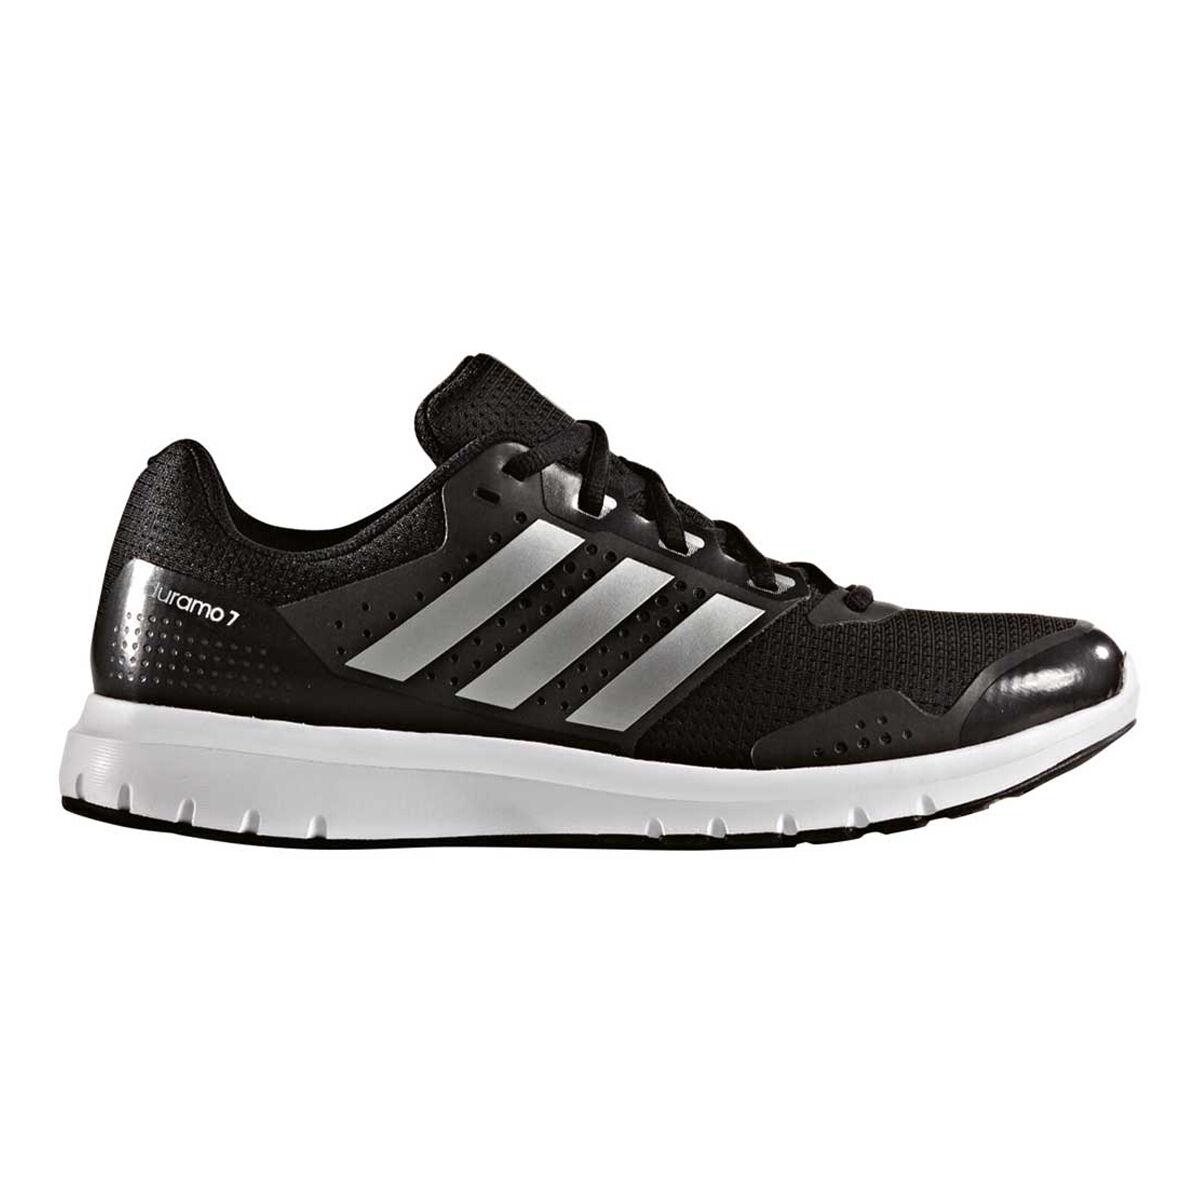 3ac746e225a57 Adidas Duramo 7 Mens Running Shoes Men s Clothes